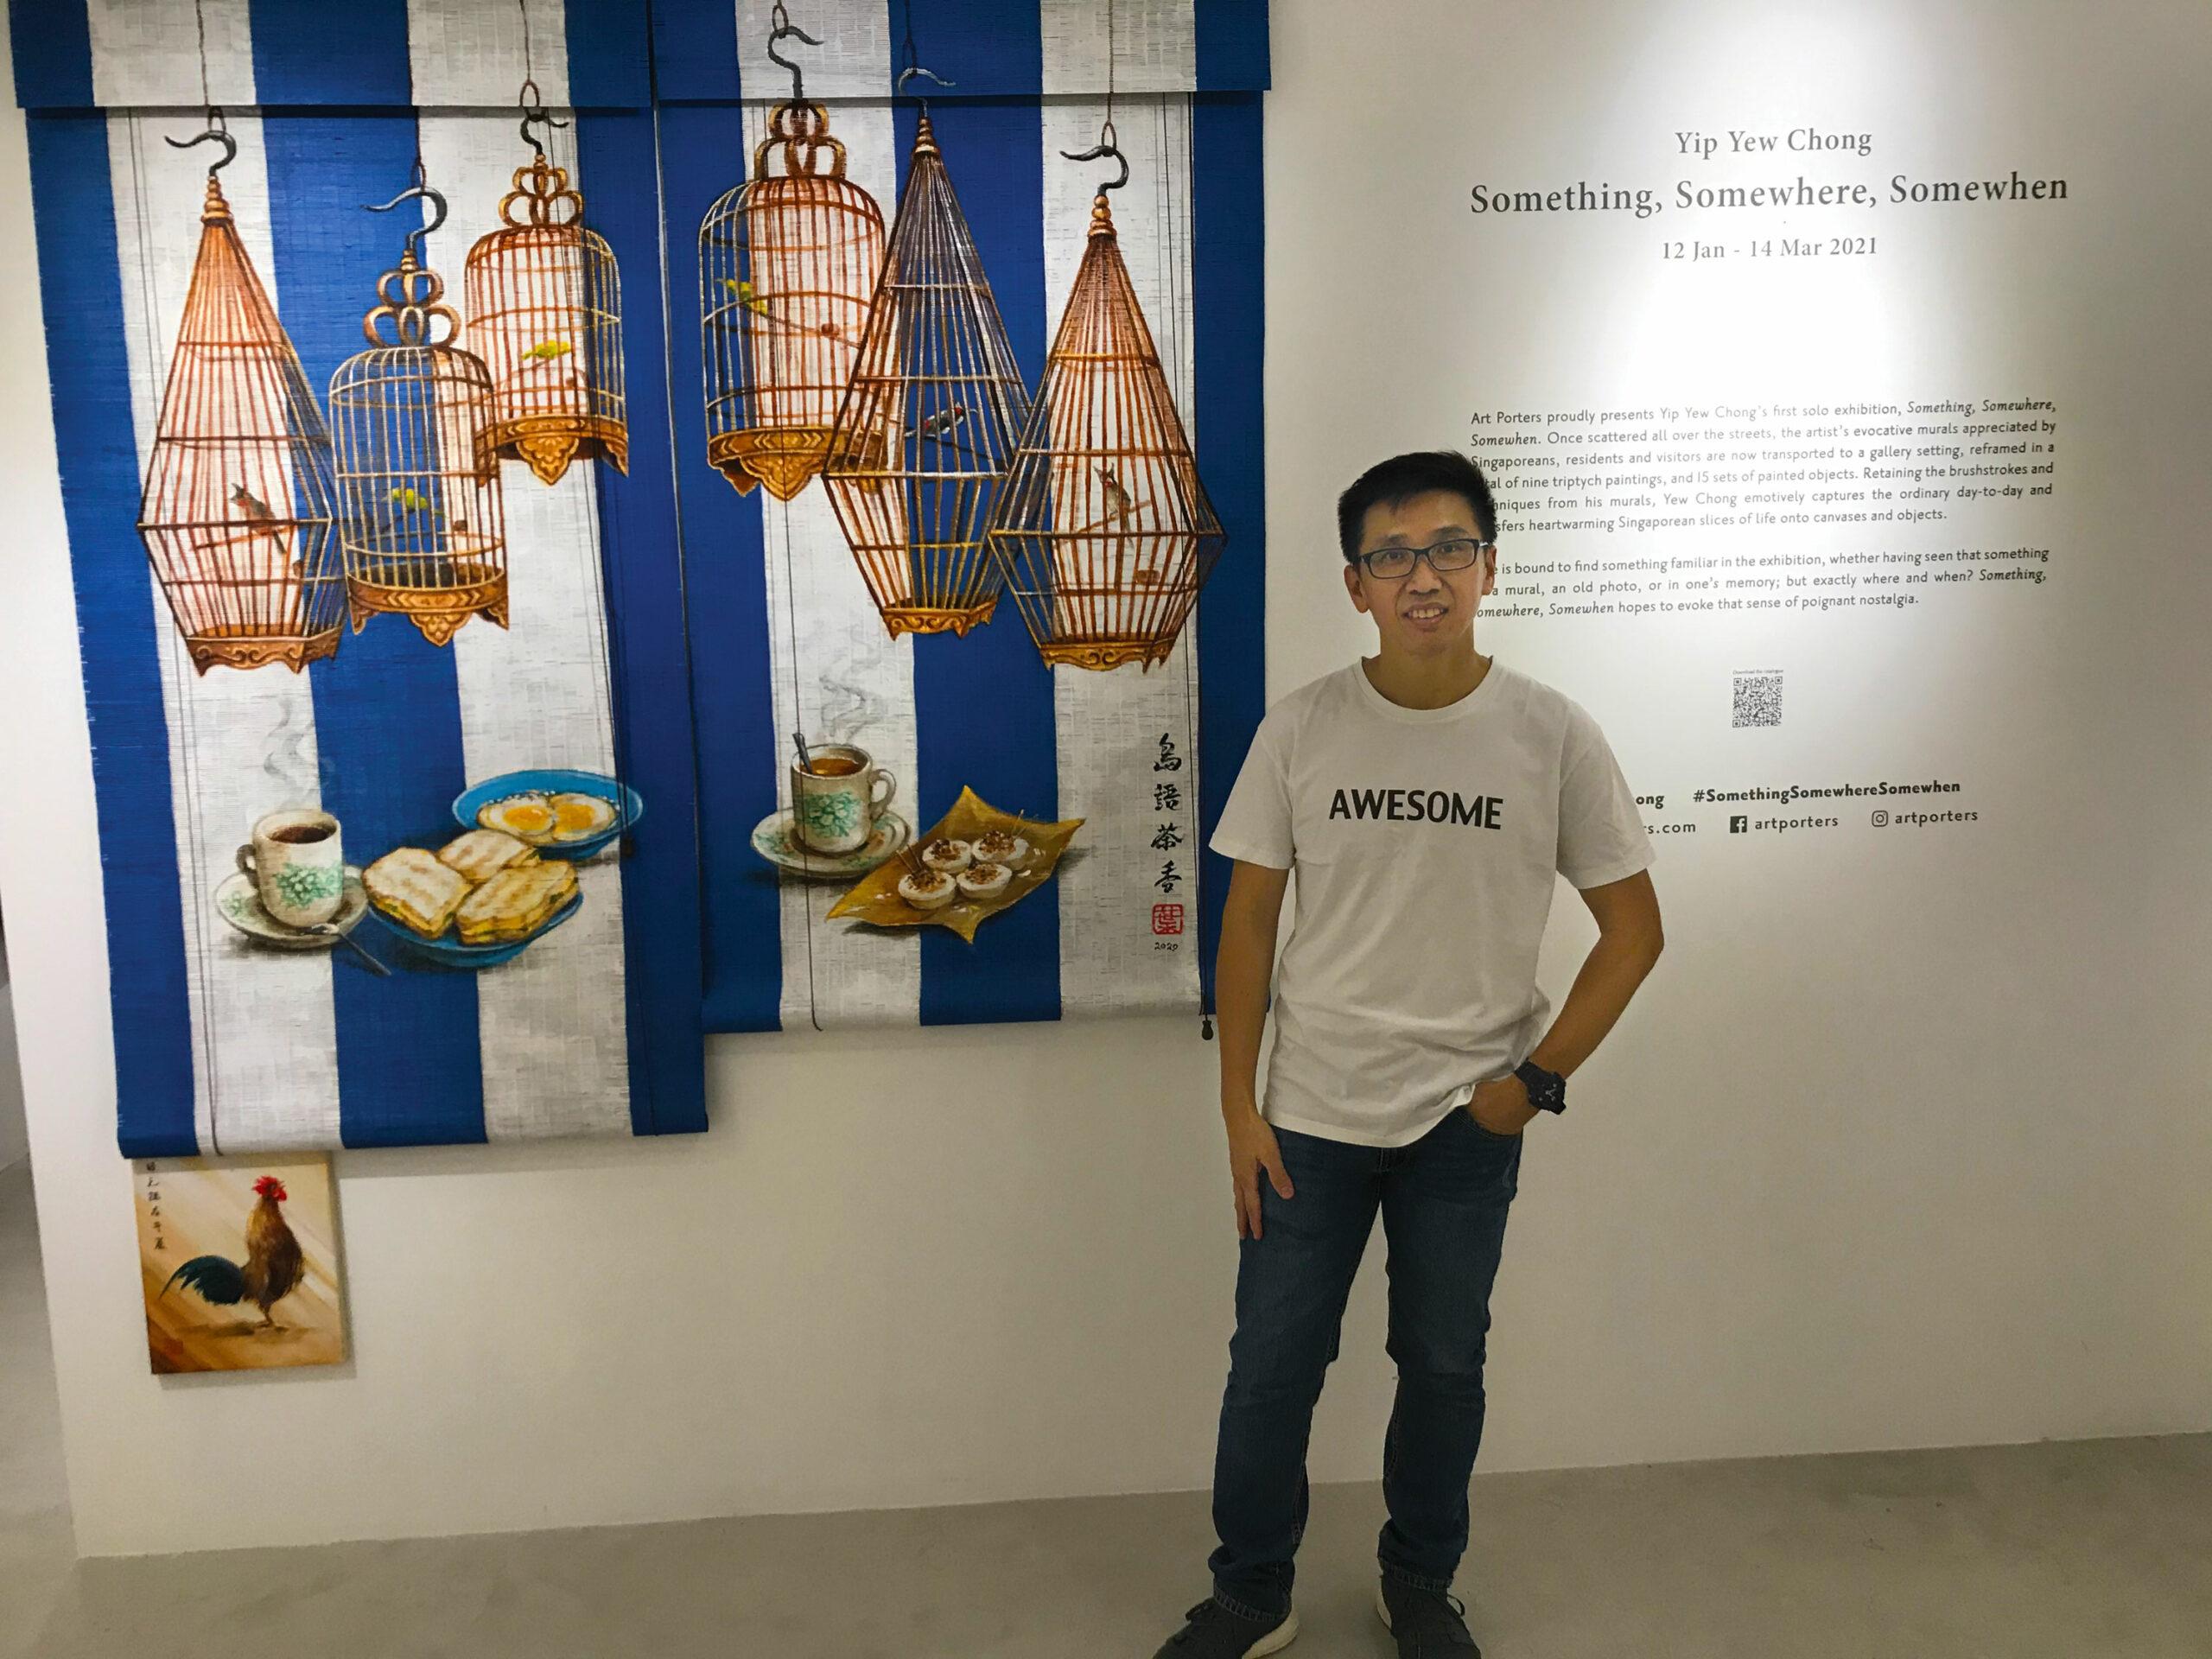 Singapore local artist